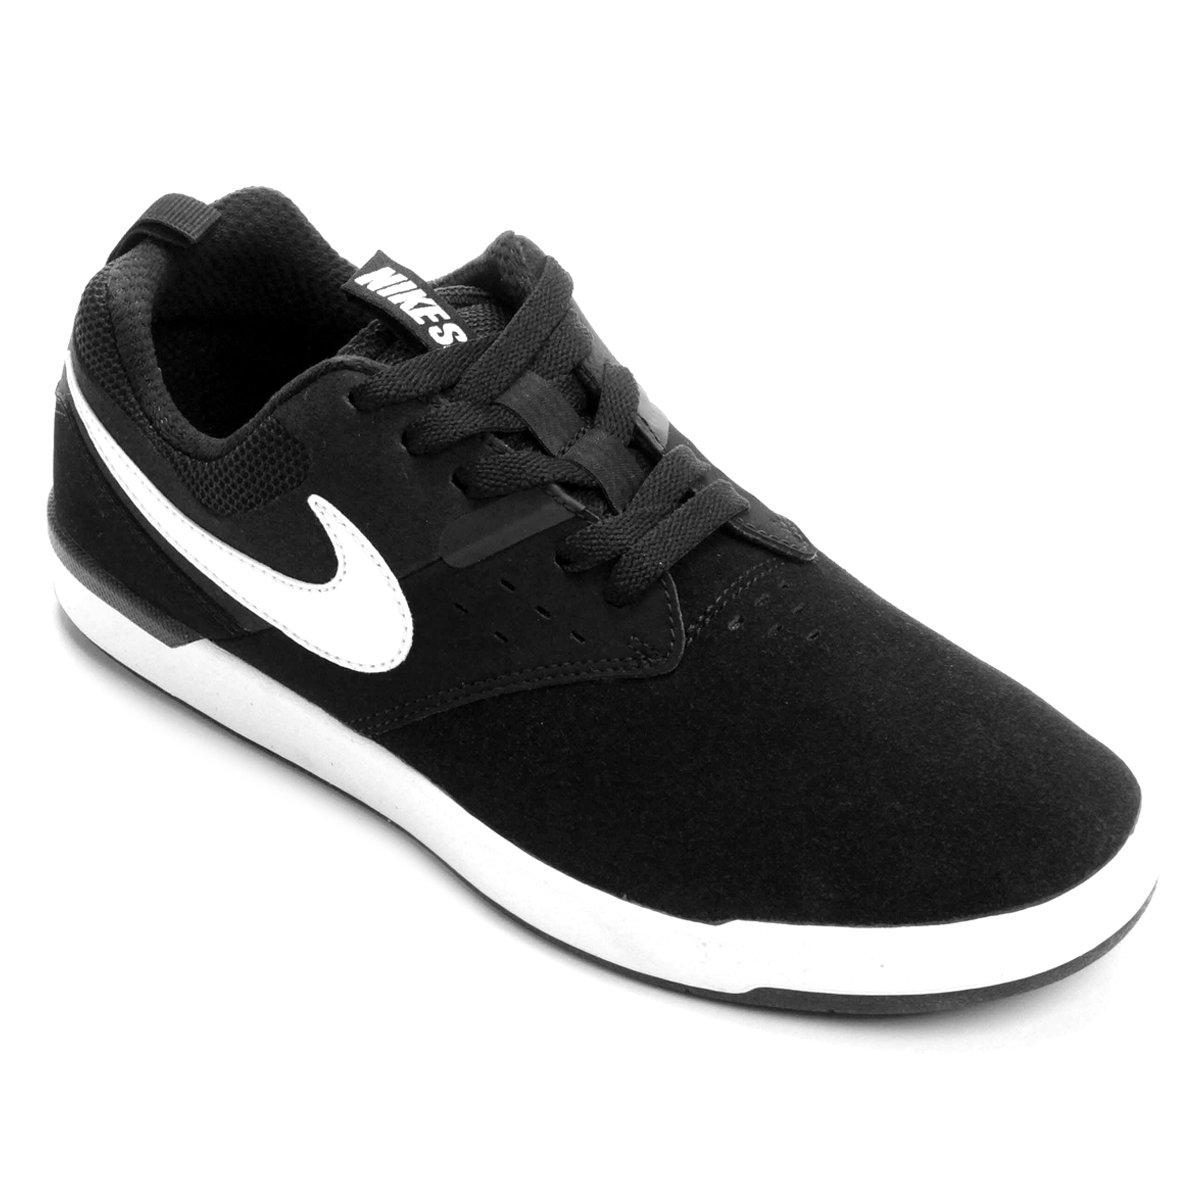 Tênis Nike SB Zoom Ejecta - Compre Agora  834b7f36d4c34